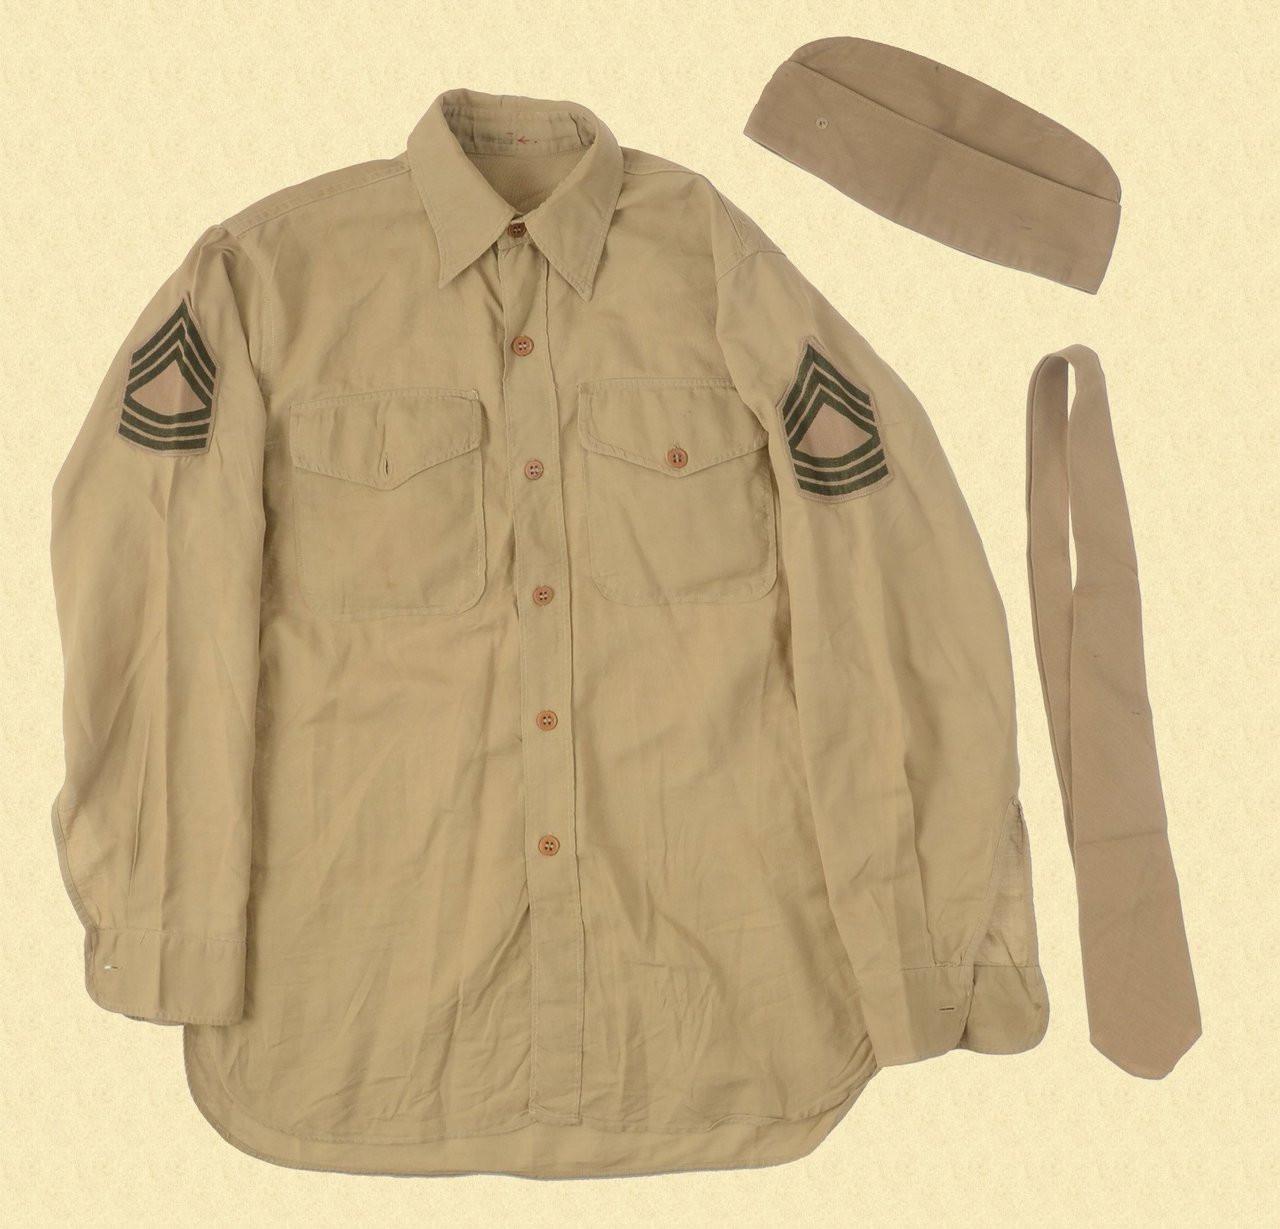 U.S.M.C. UNIFORM LOT - C29696